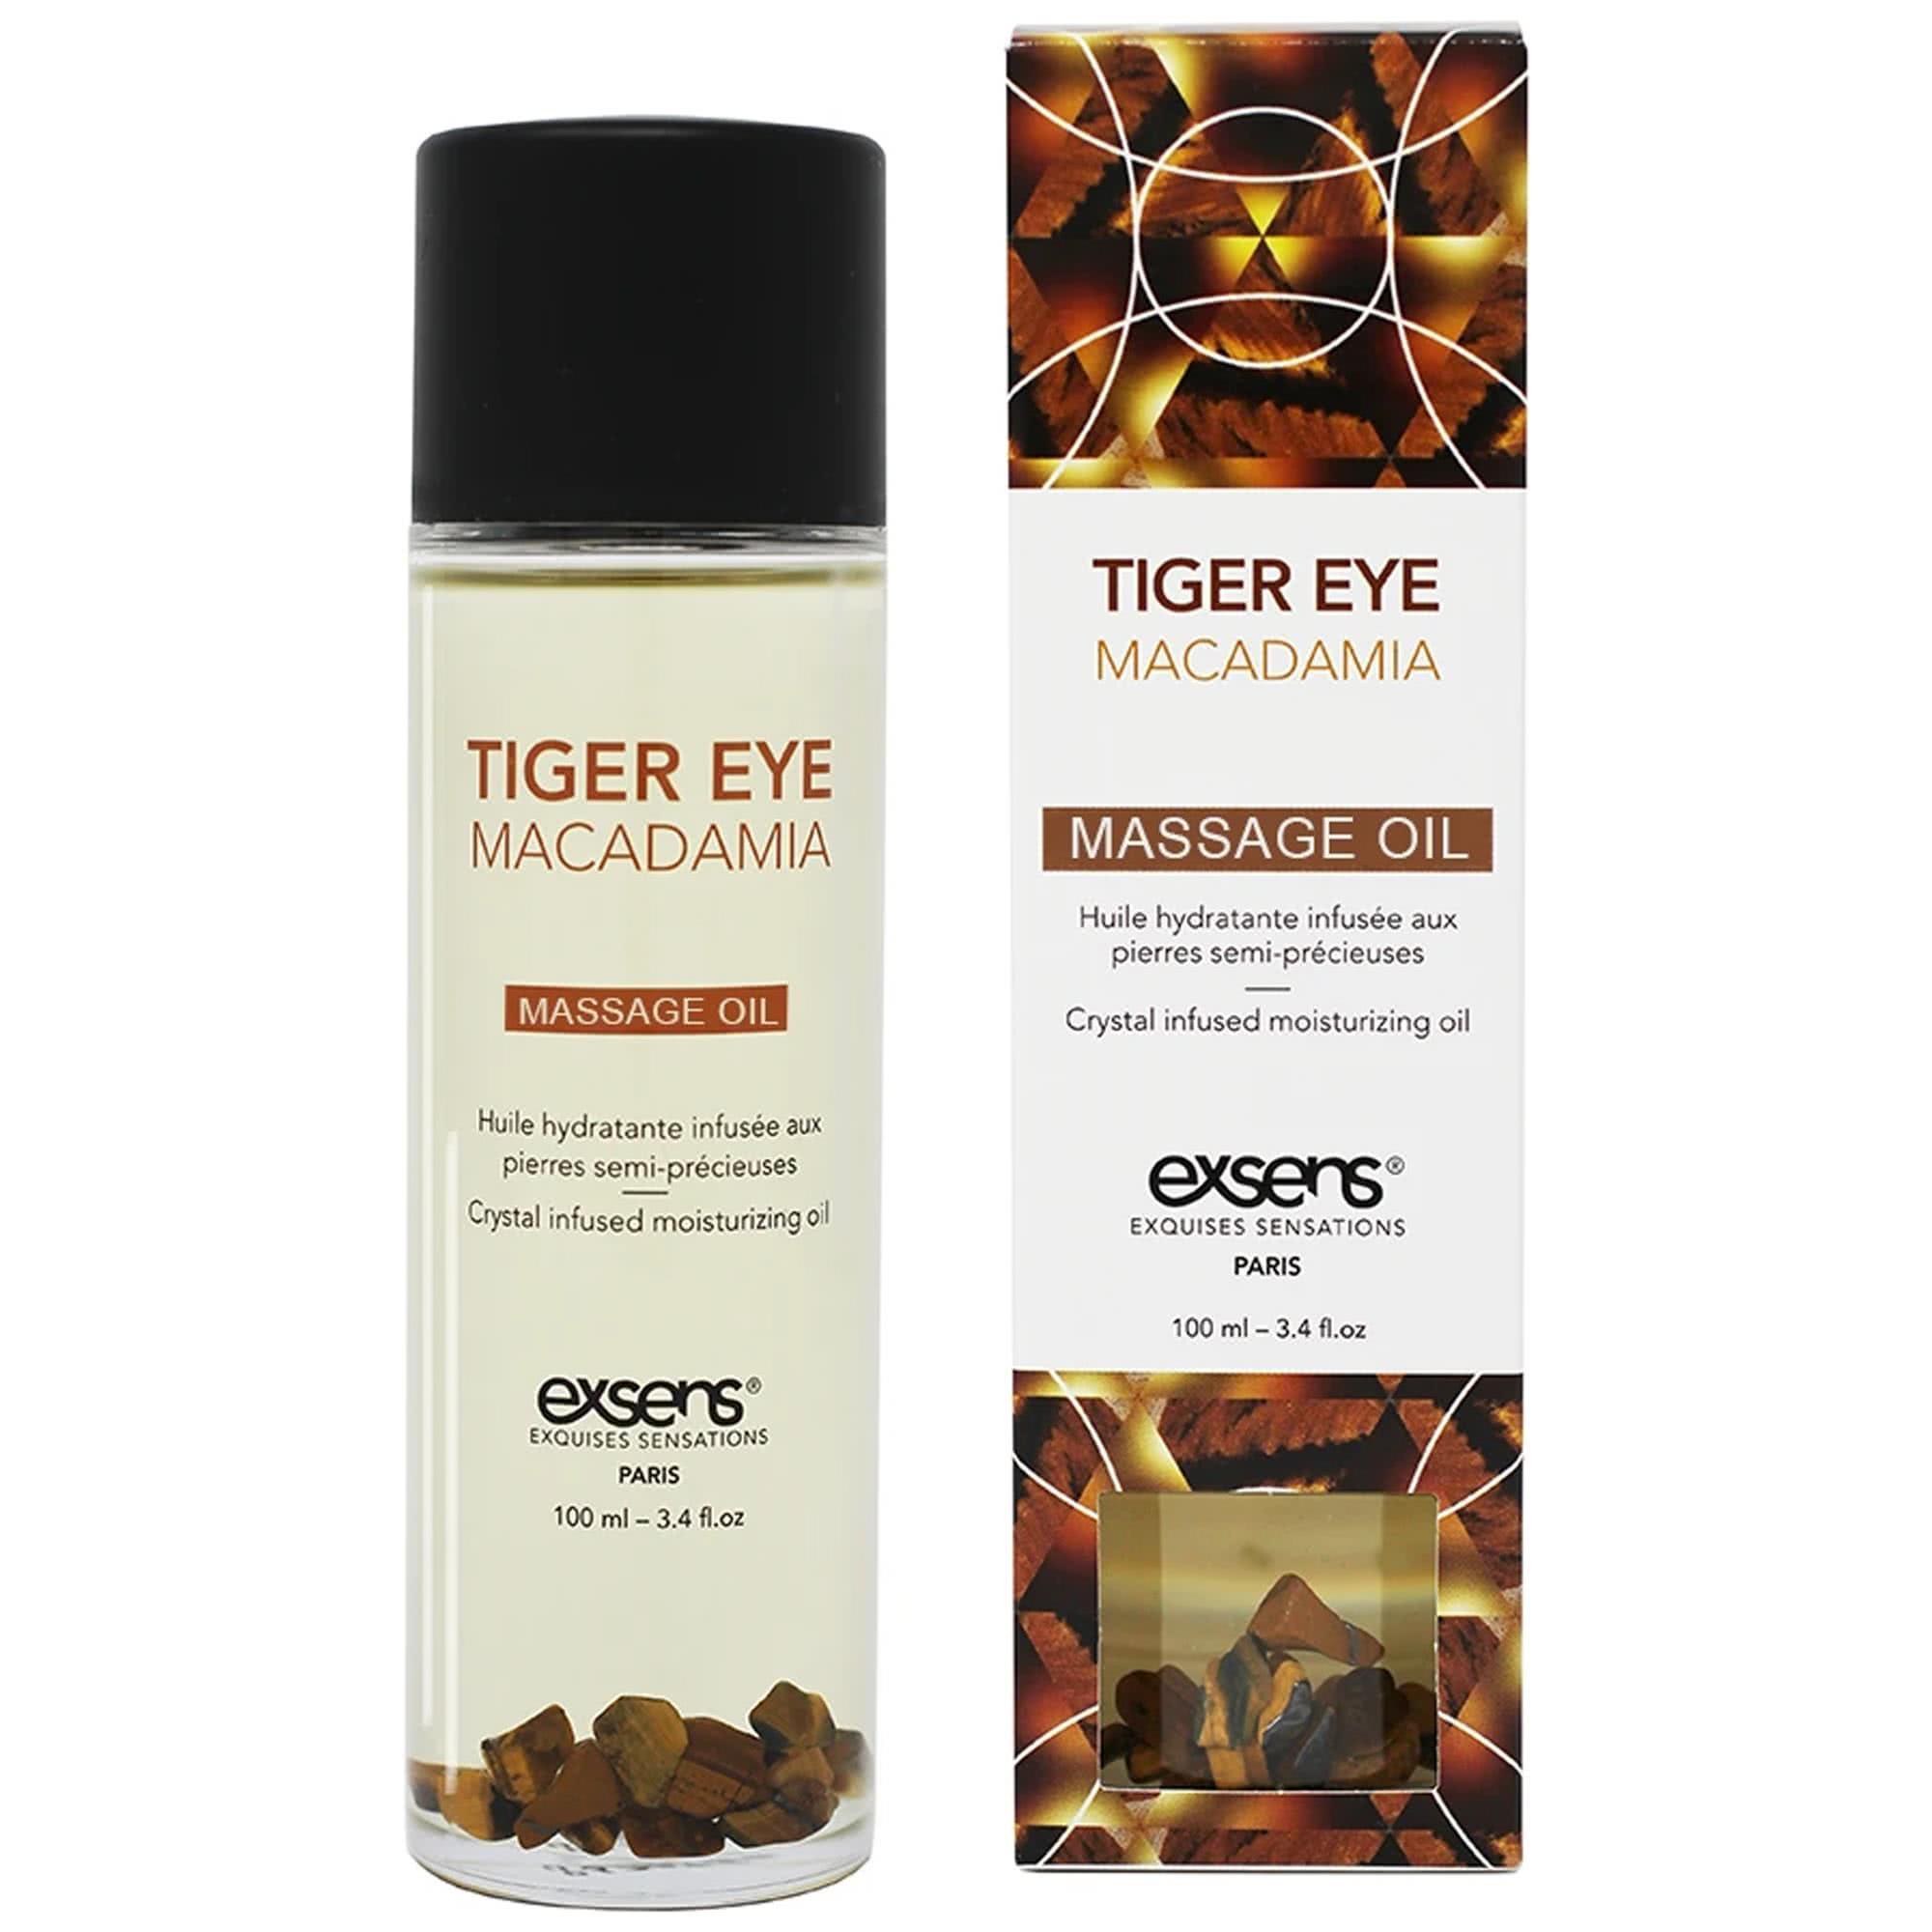 Exsens - Organic Massage Oil w. Stones Macadamia